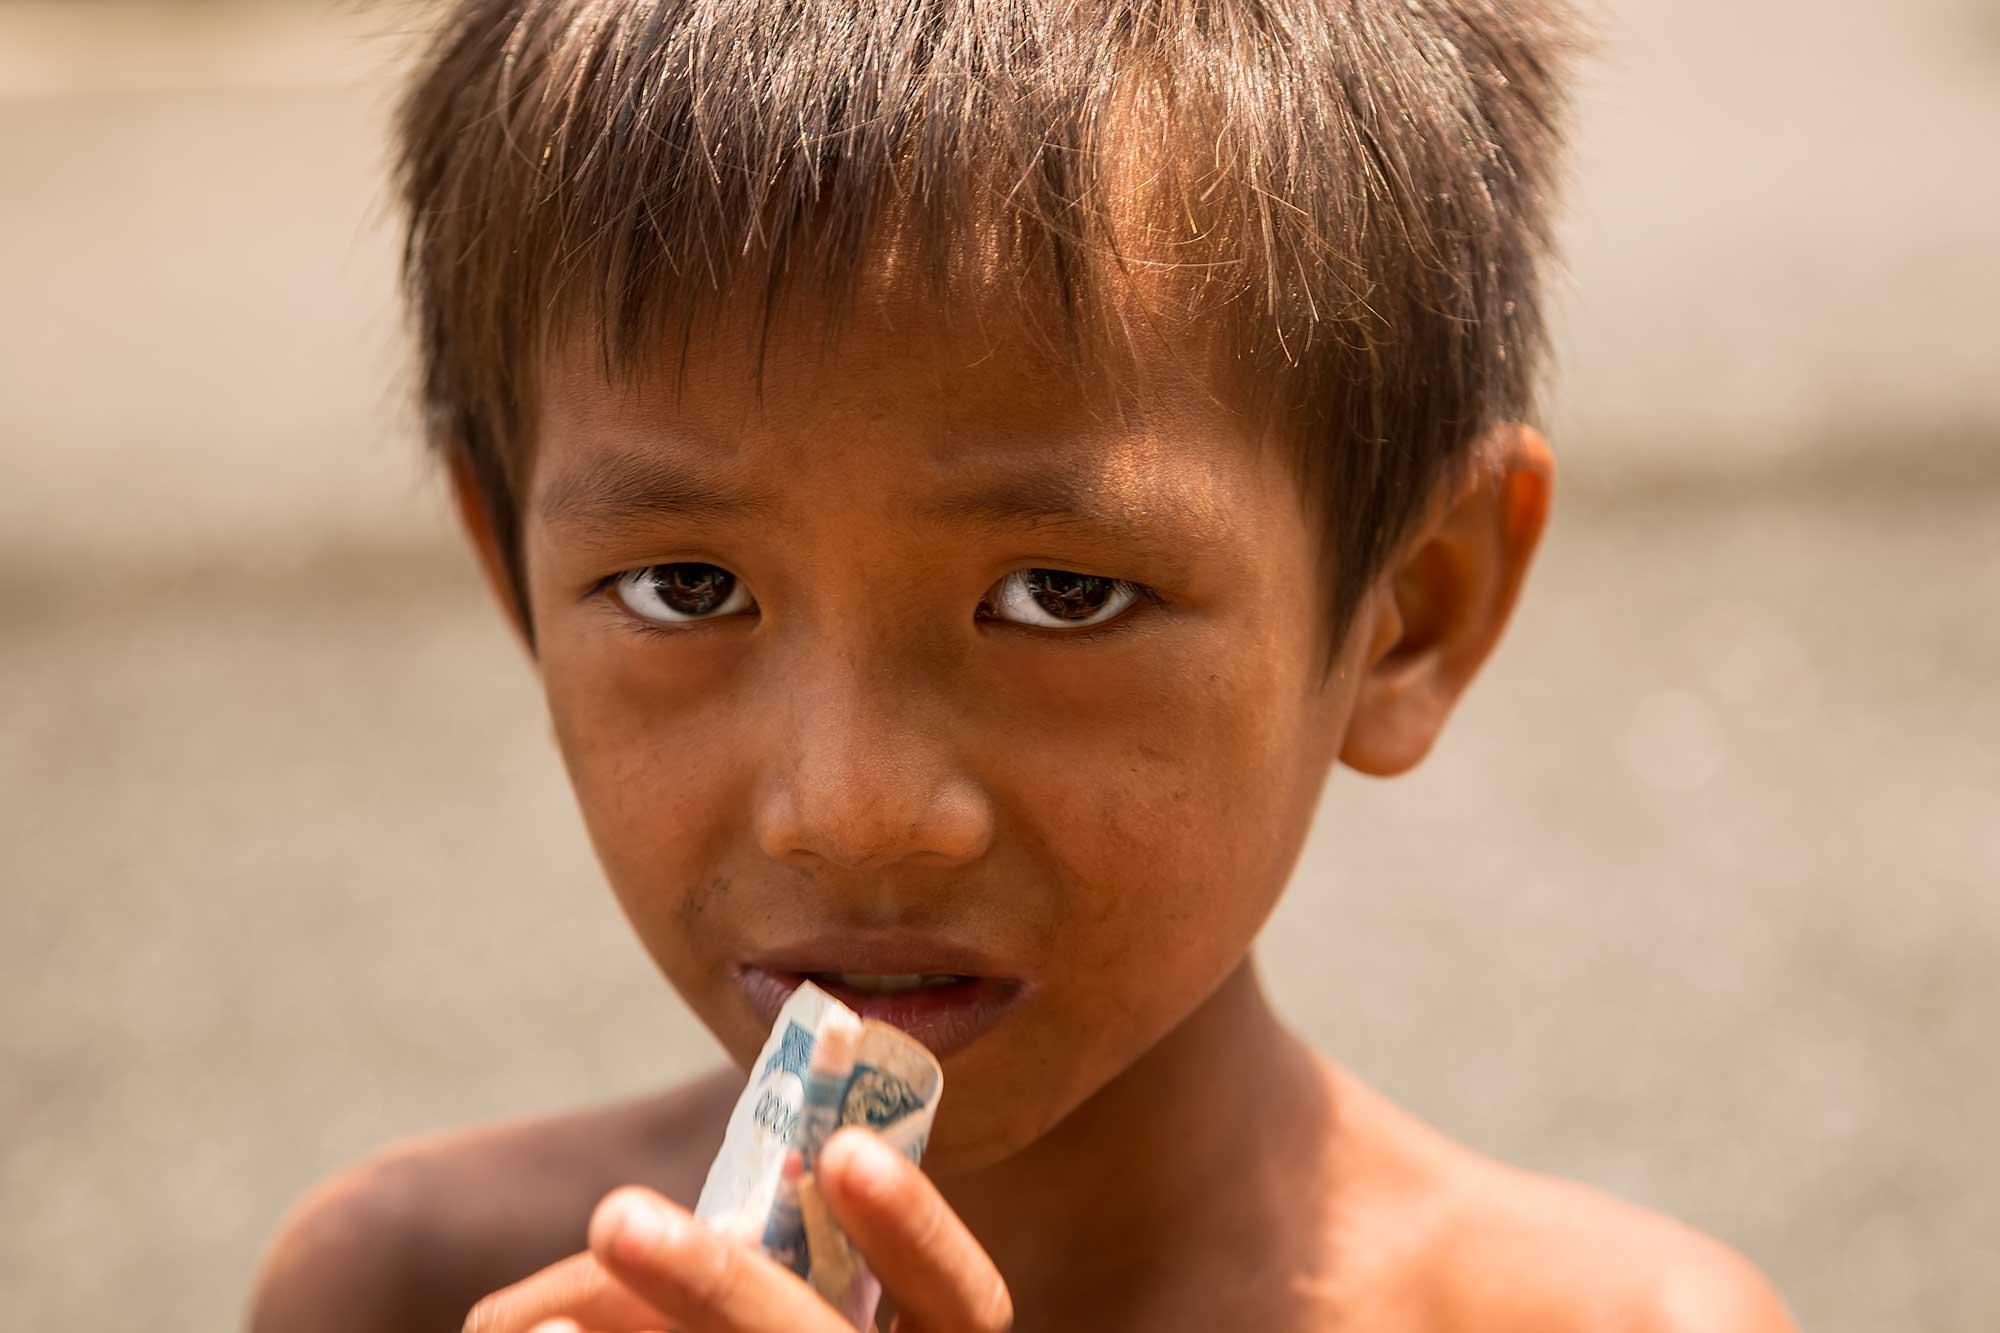 Portrait of a street boy in Phnom Penh, Cambodia. © Ulli Maier & Nisa Maier